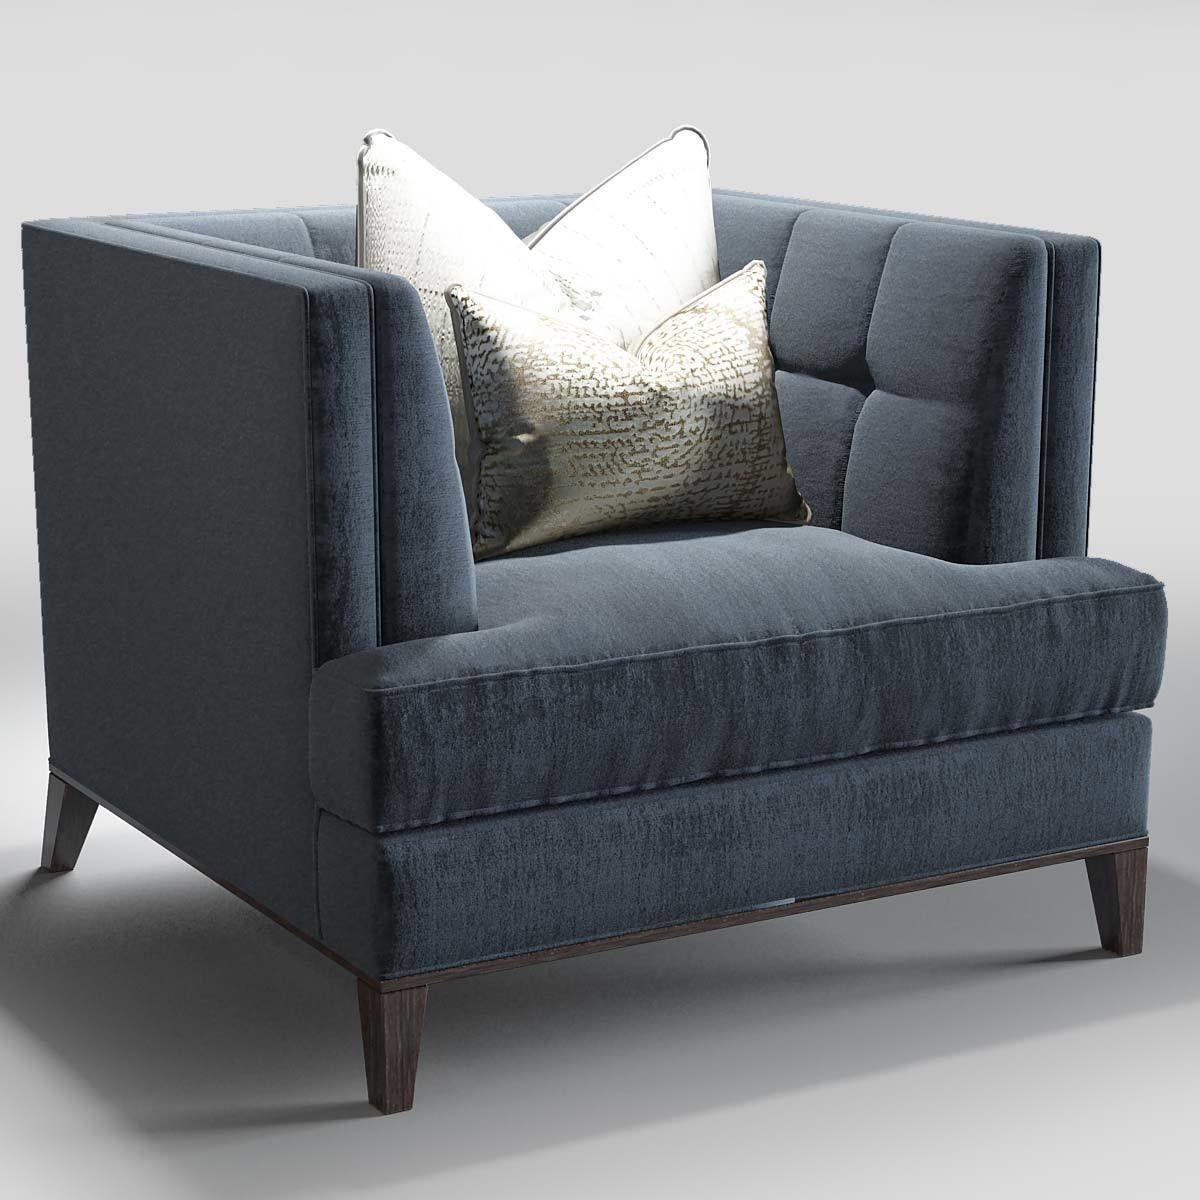 Charmant ... The Sofa And Chair Company Preston Sofa Hirst Table 3d Model Max Obj ...